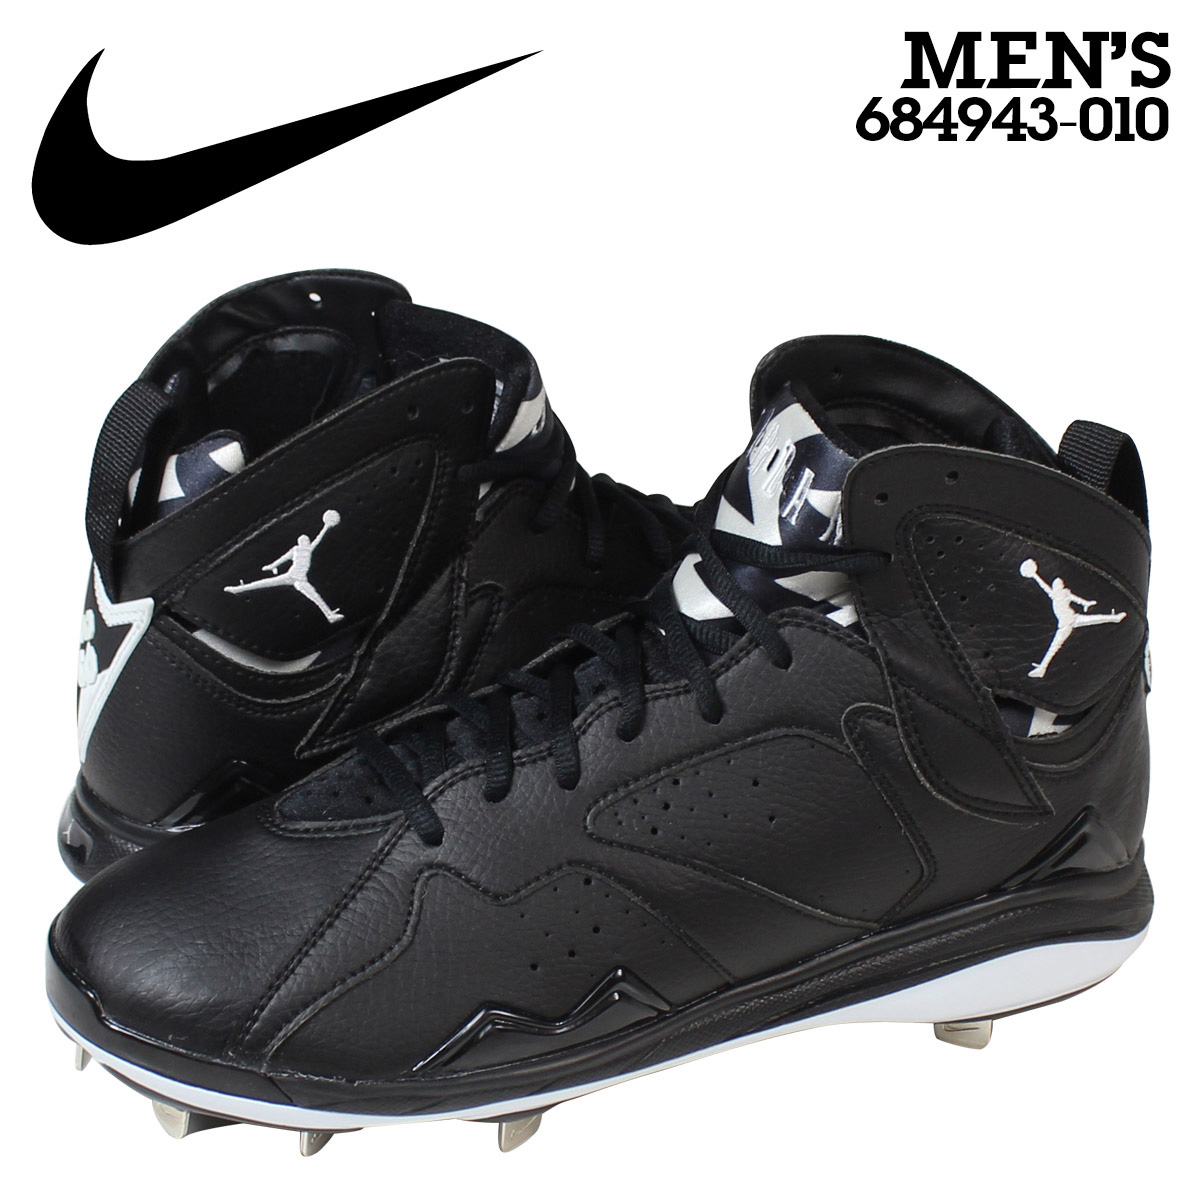 outlet store 6d4fd cfd45 NIKE Nike Air Jordan 7 nostalgic spikes men AIR JORDAN 7 RETRO METAL  684,943-010 black black